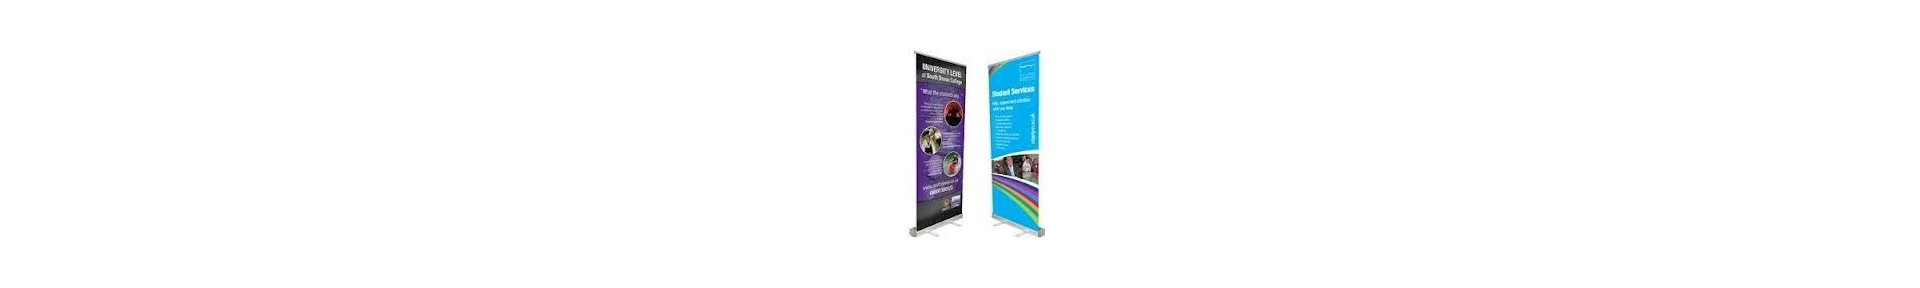 Vinyl Banners, Custom Vinyl Banner Printing